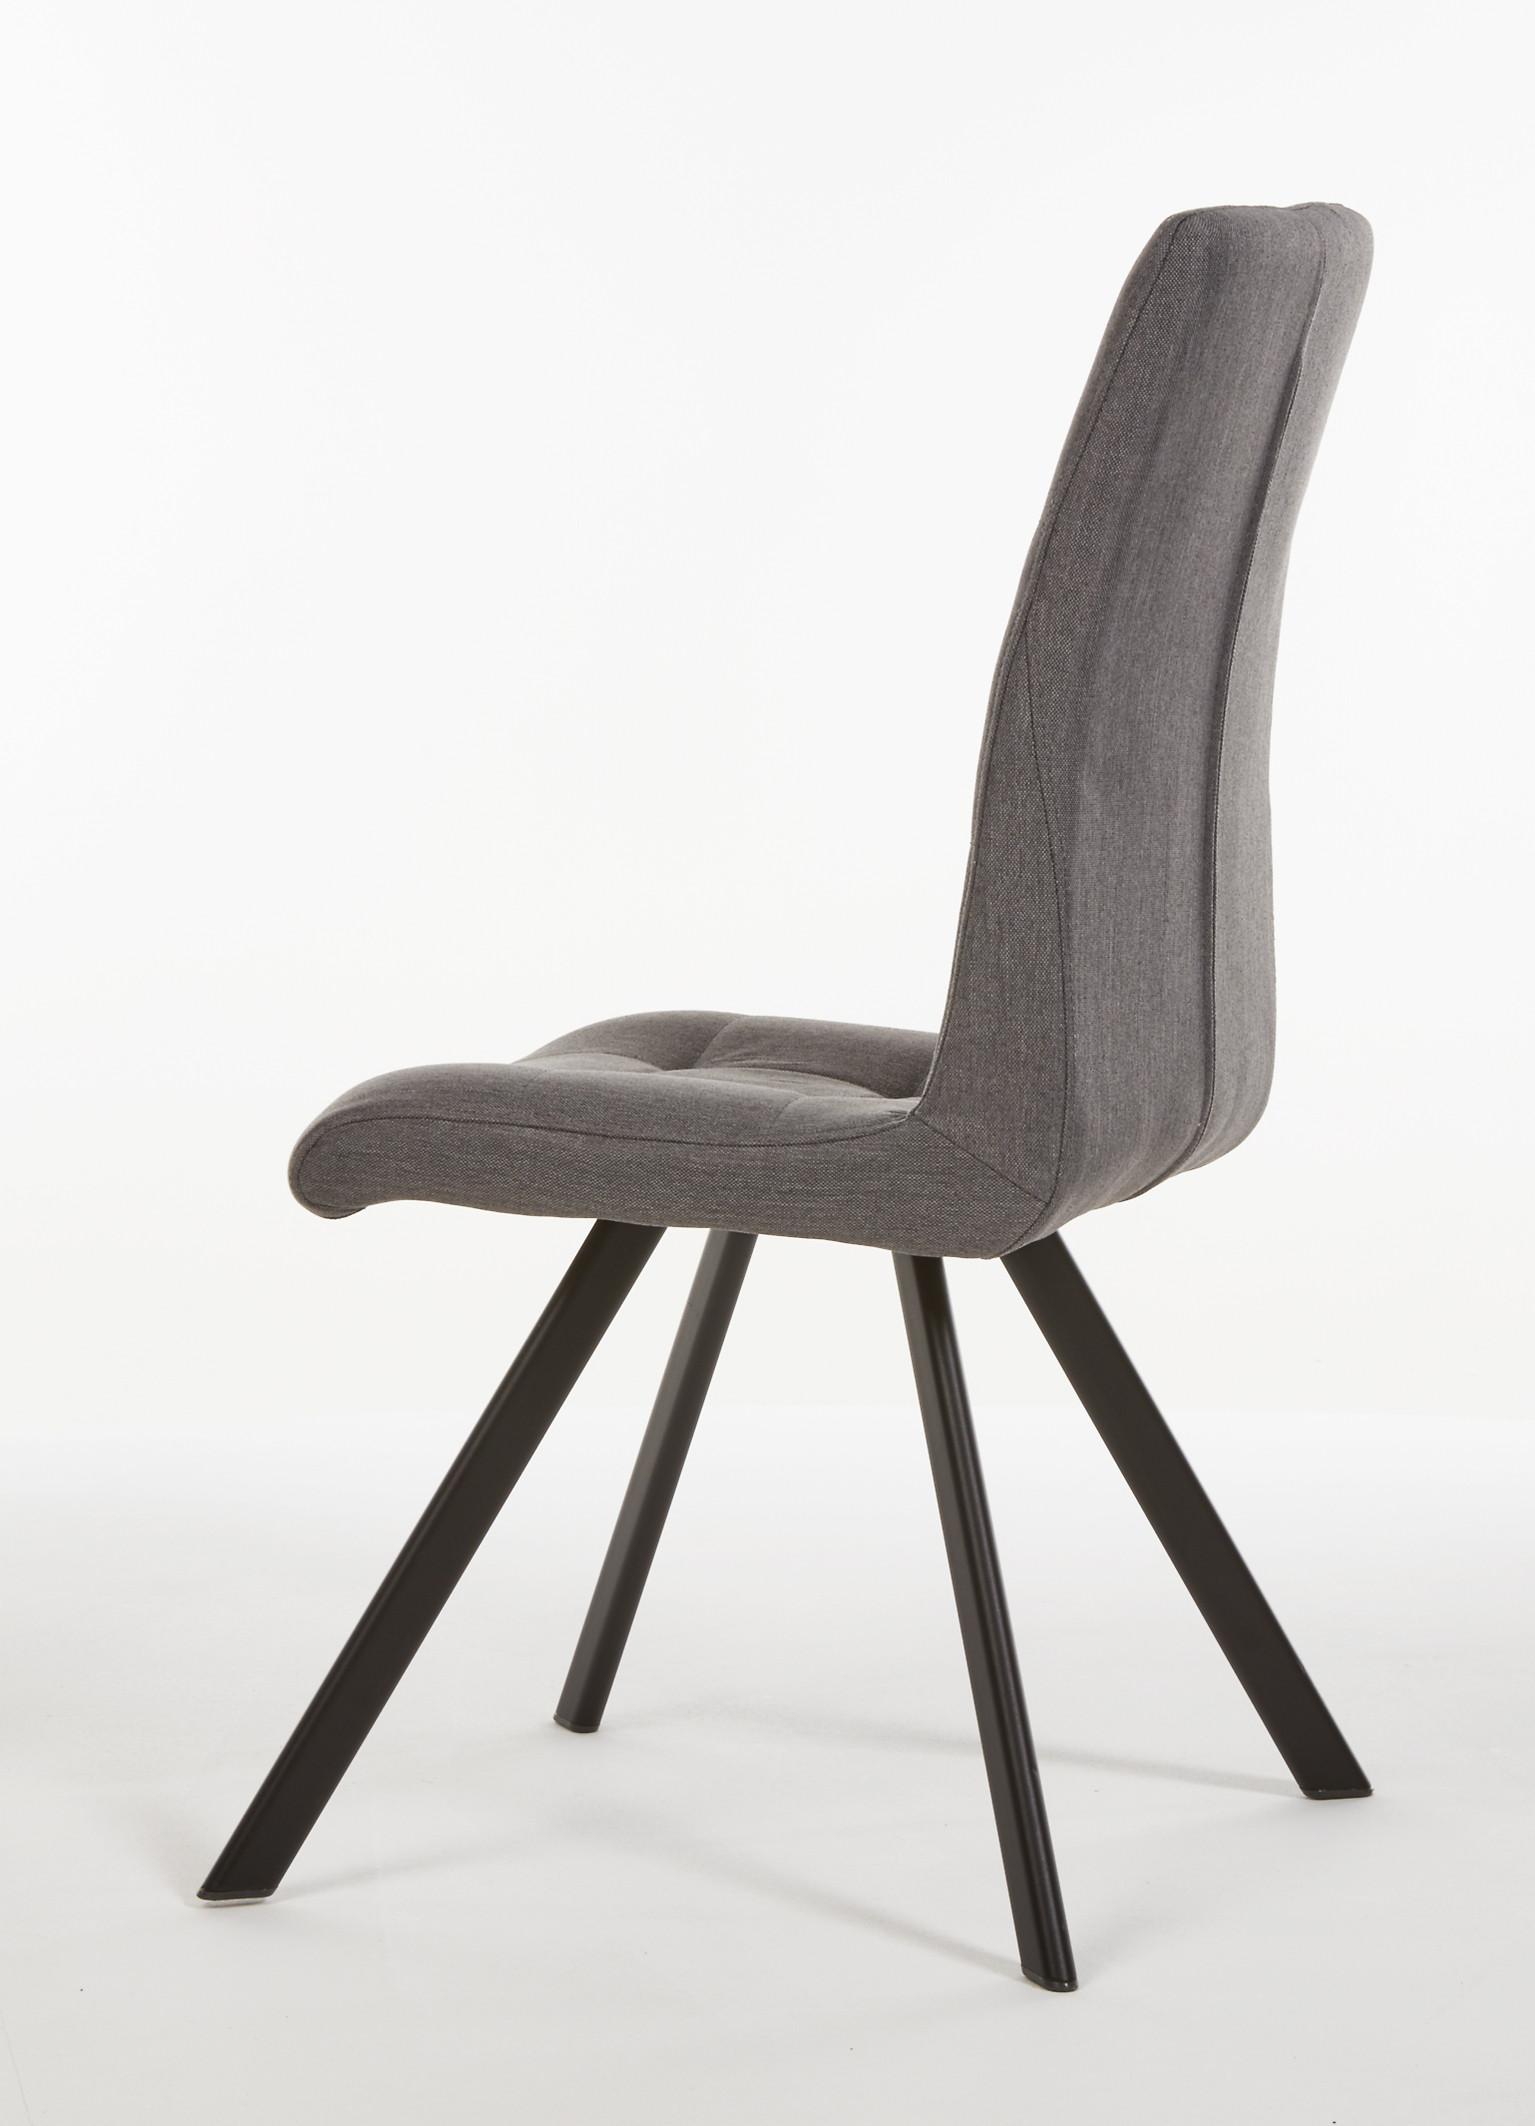 Lot of 2 chairs BAILA